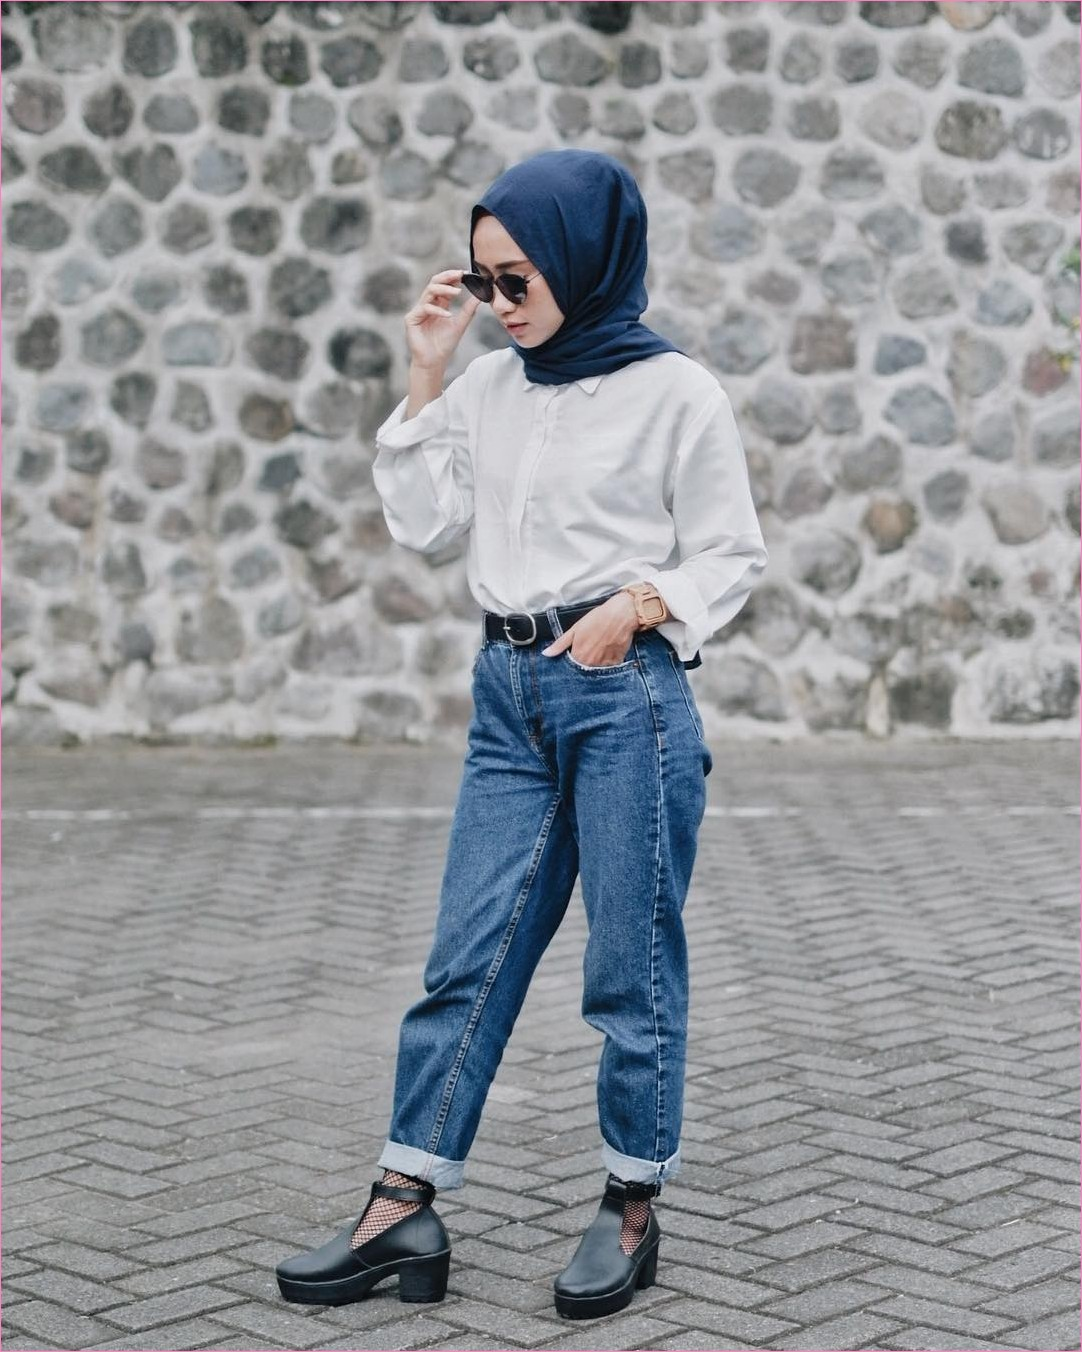 Outfit Celana Jeans Untuk Hijabers Ala Selebgram 2018 blouse kemeja putih hijab pashmina diamond biru dongker pants jeans denim ciput flatshoes heel hitam jam tangan krem kacamata bulat ootd trendy